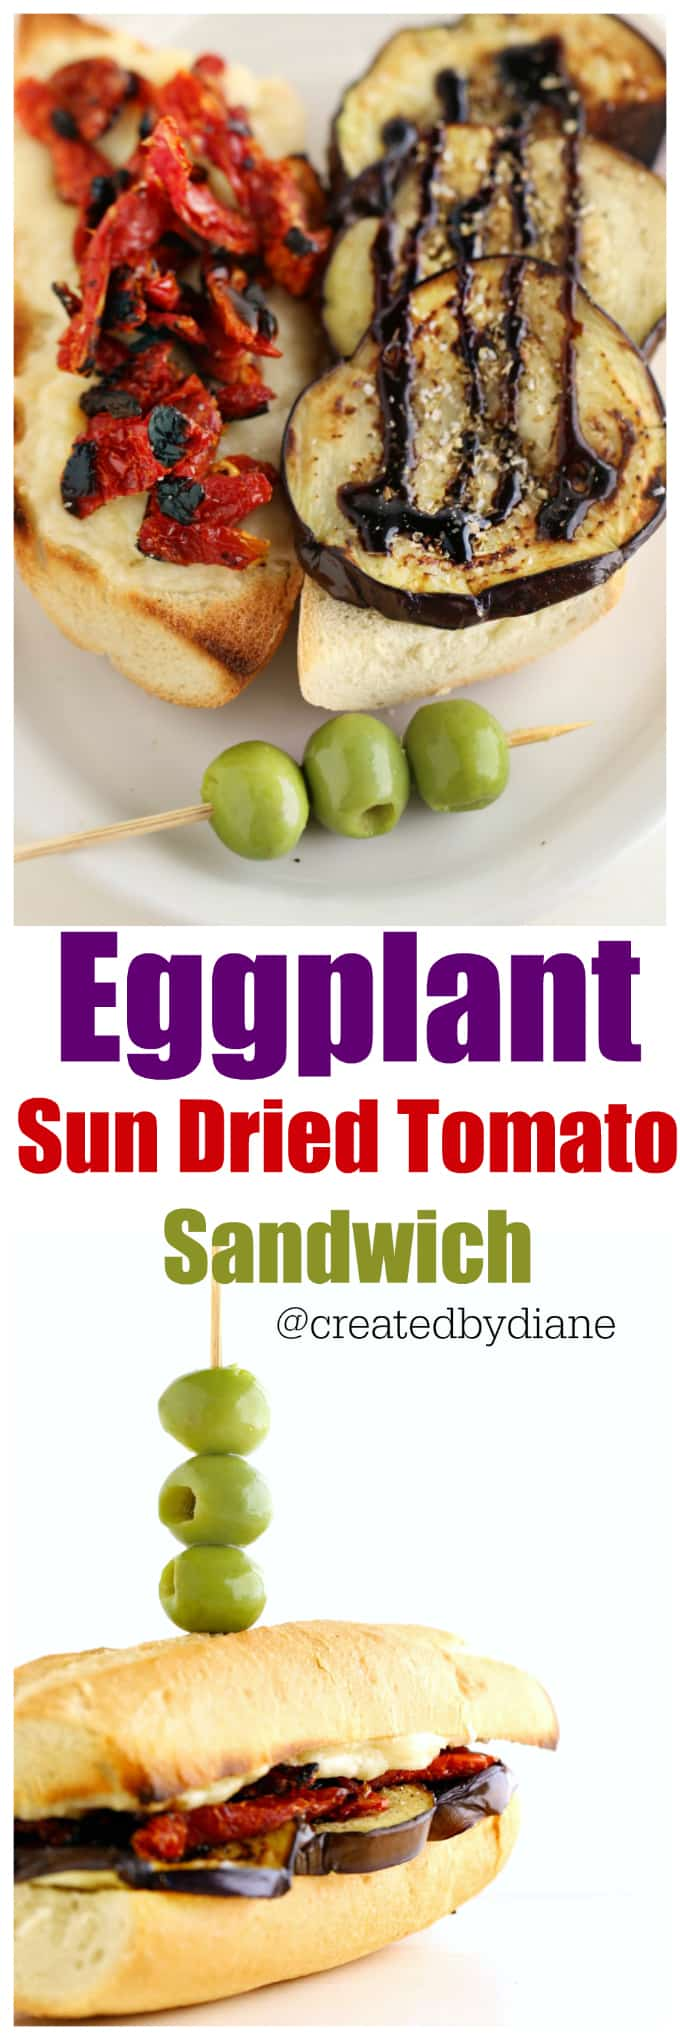 eggplant-sun-dried-tomato-sandwich-createdbydiane